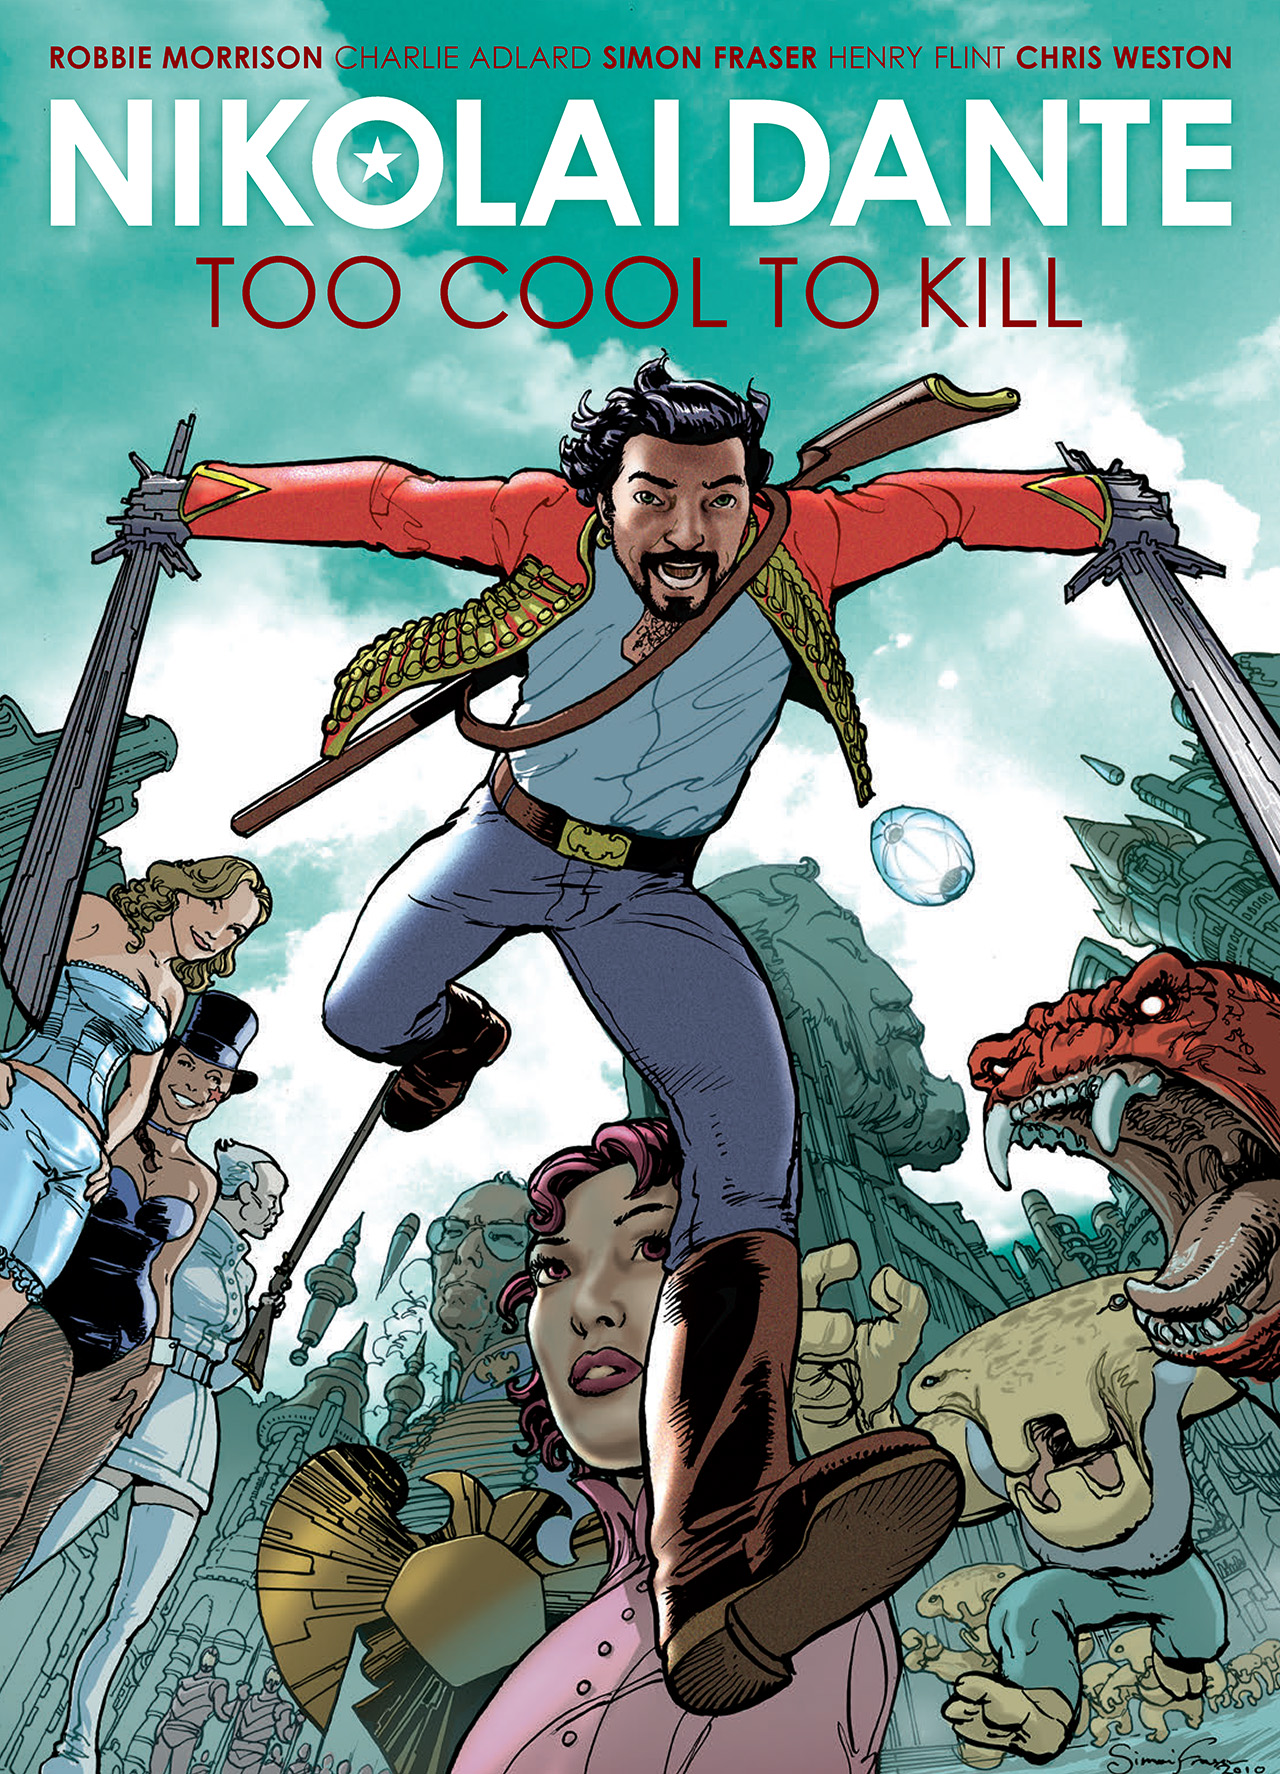 Read online Nikolai Dante comic -  Issue # TPB 1 - 1